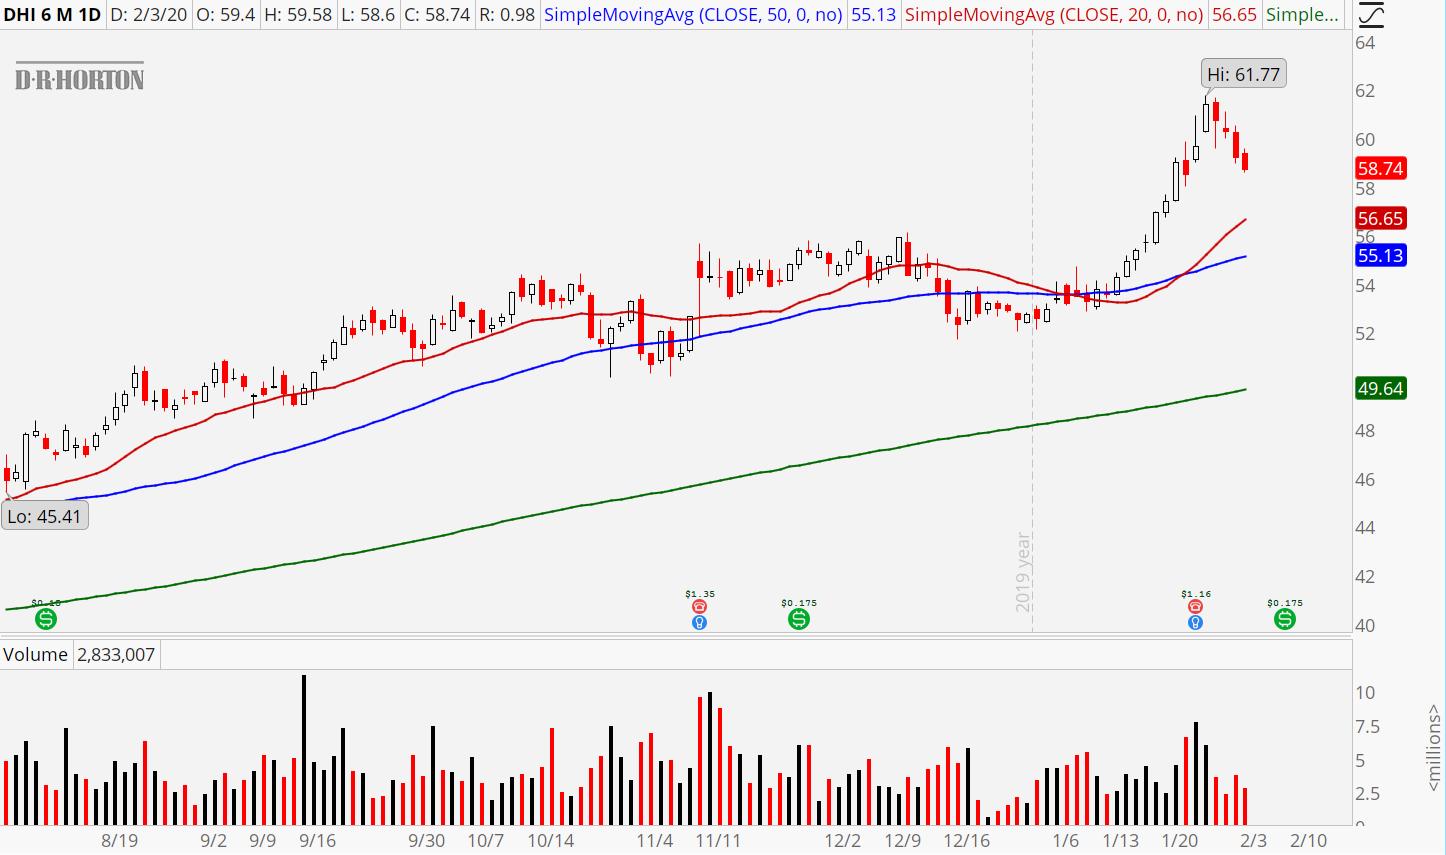 Homebuilding Stocks to Buy Now: D.R. Horton (DHI)